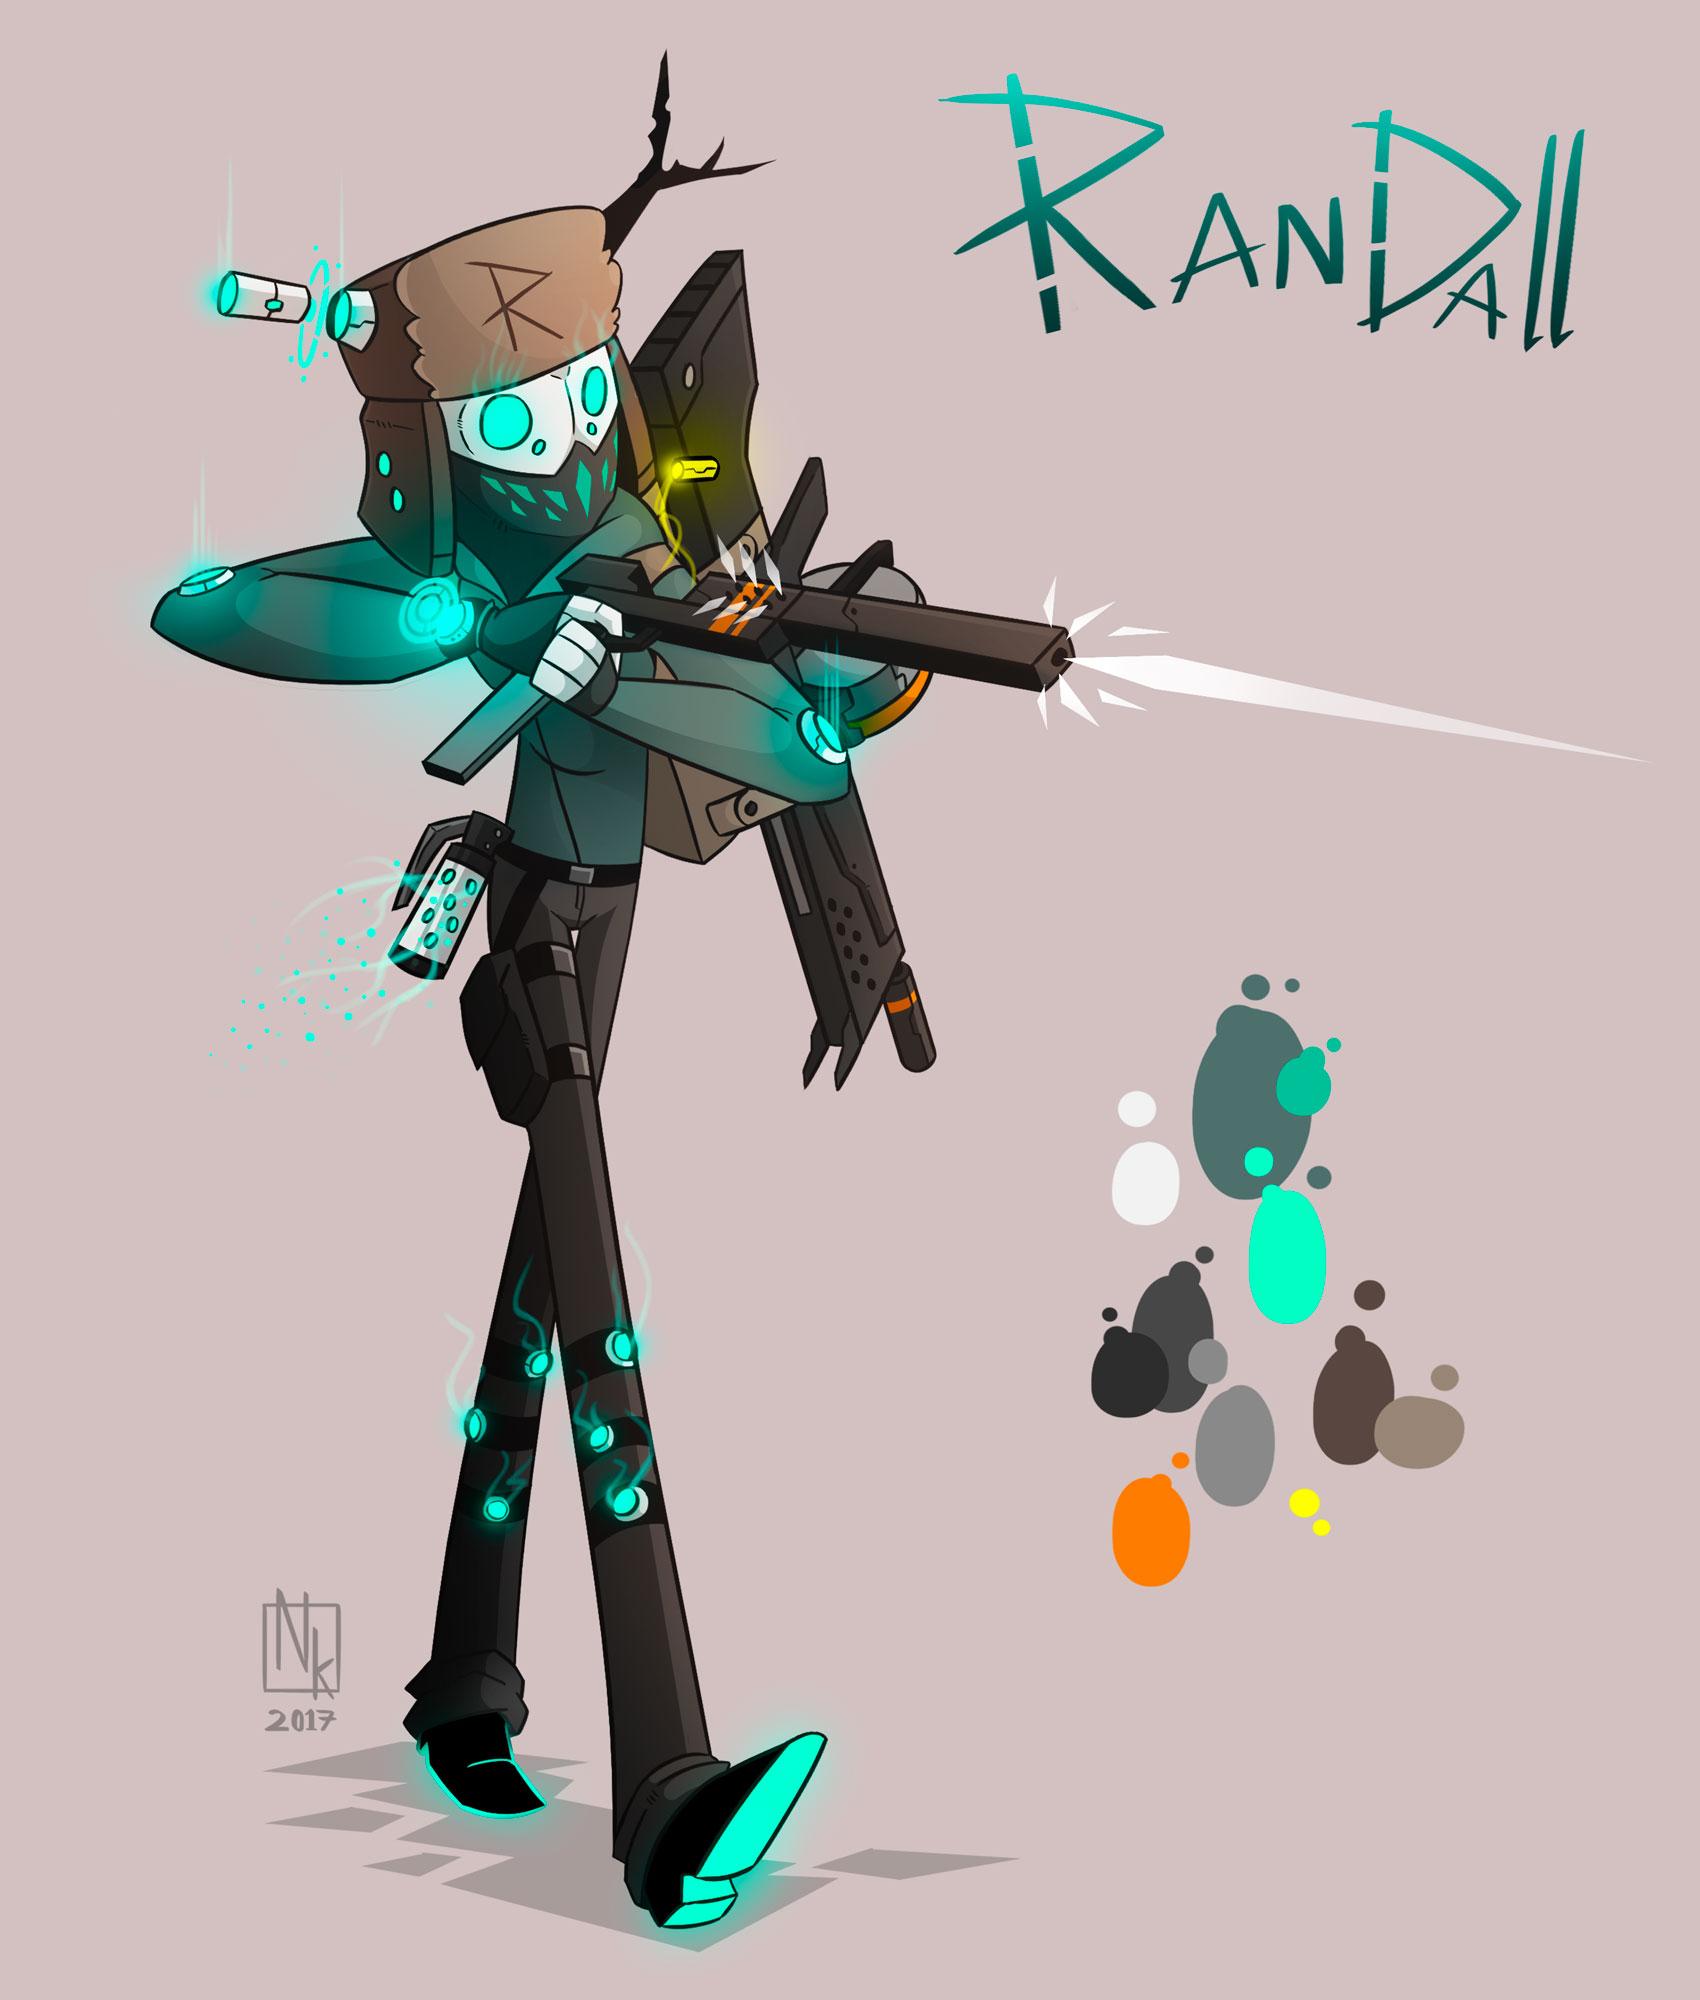 Webcomic character #8: Randall